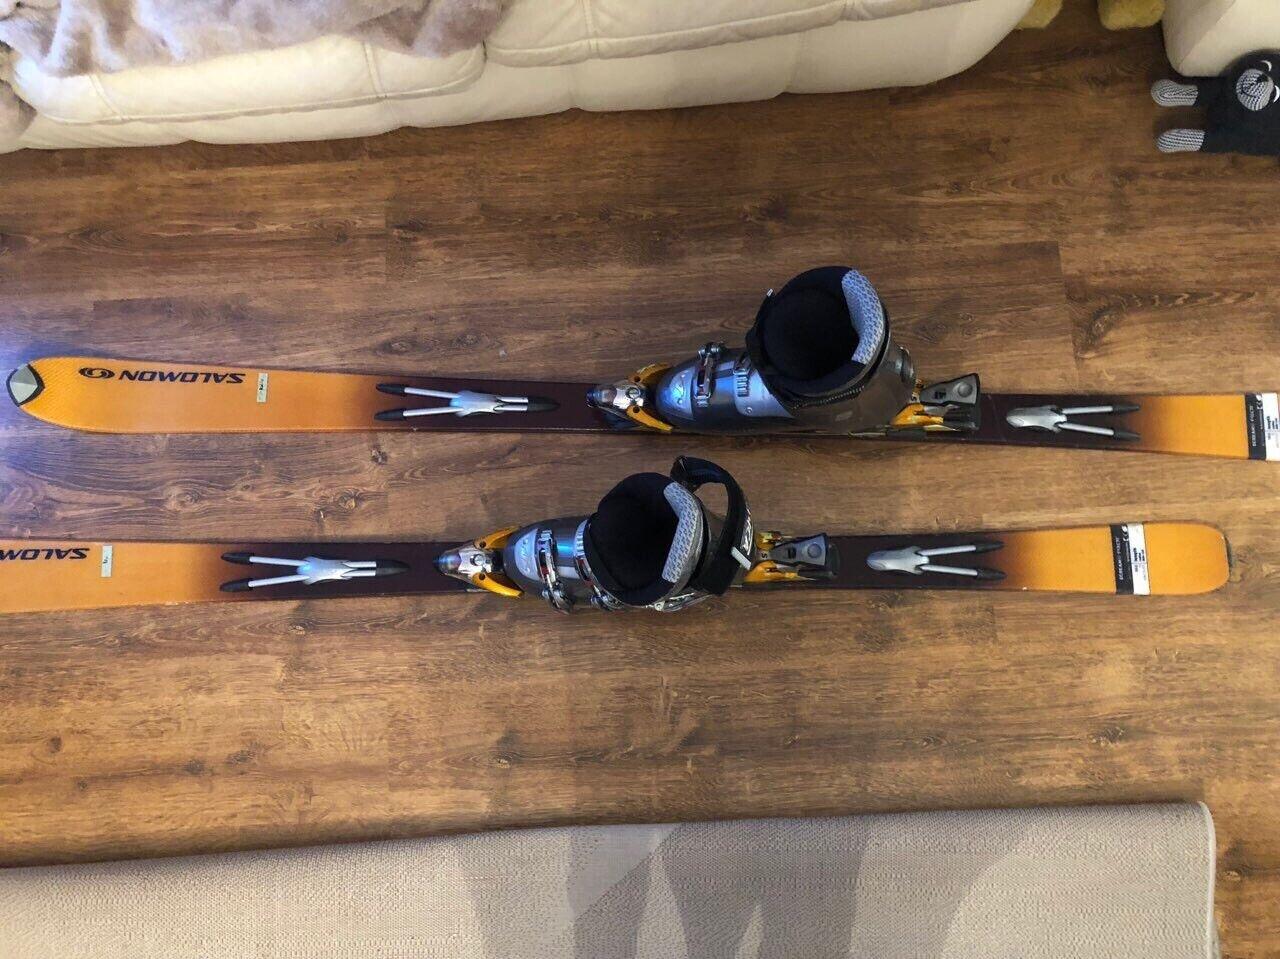 Salomon Skis + Nordica Ski Boots